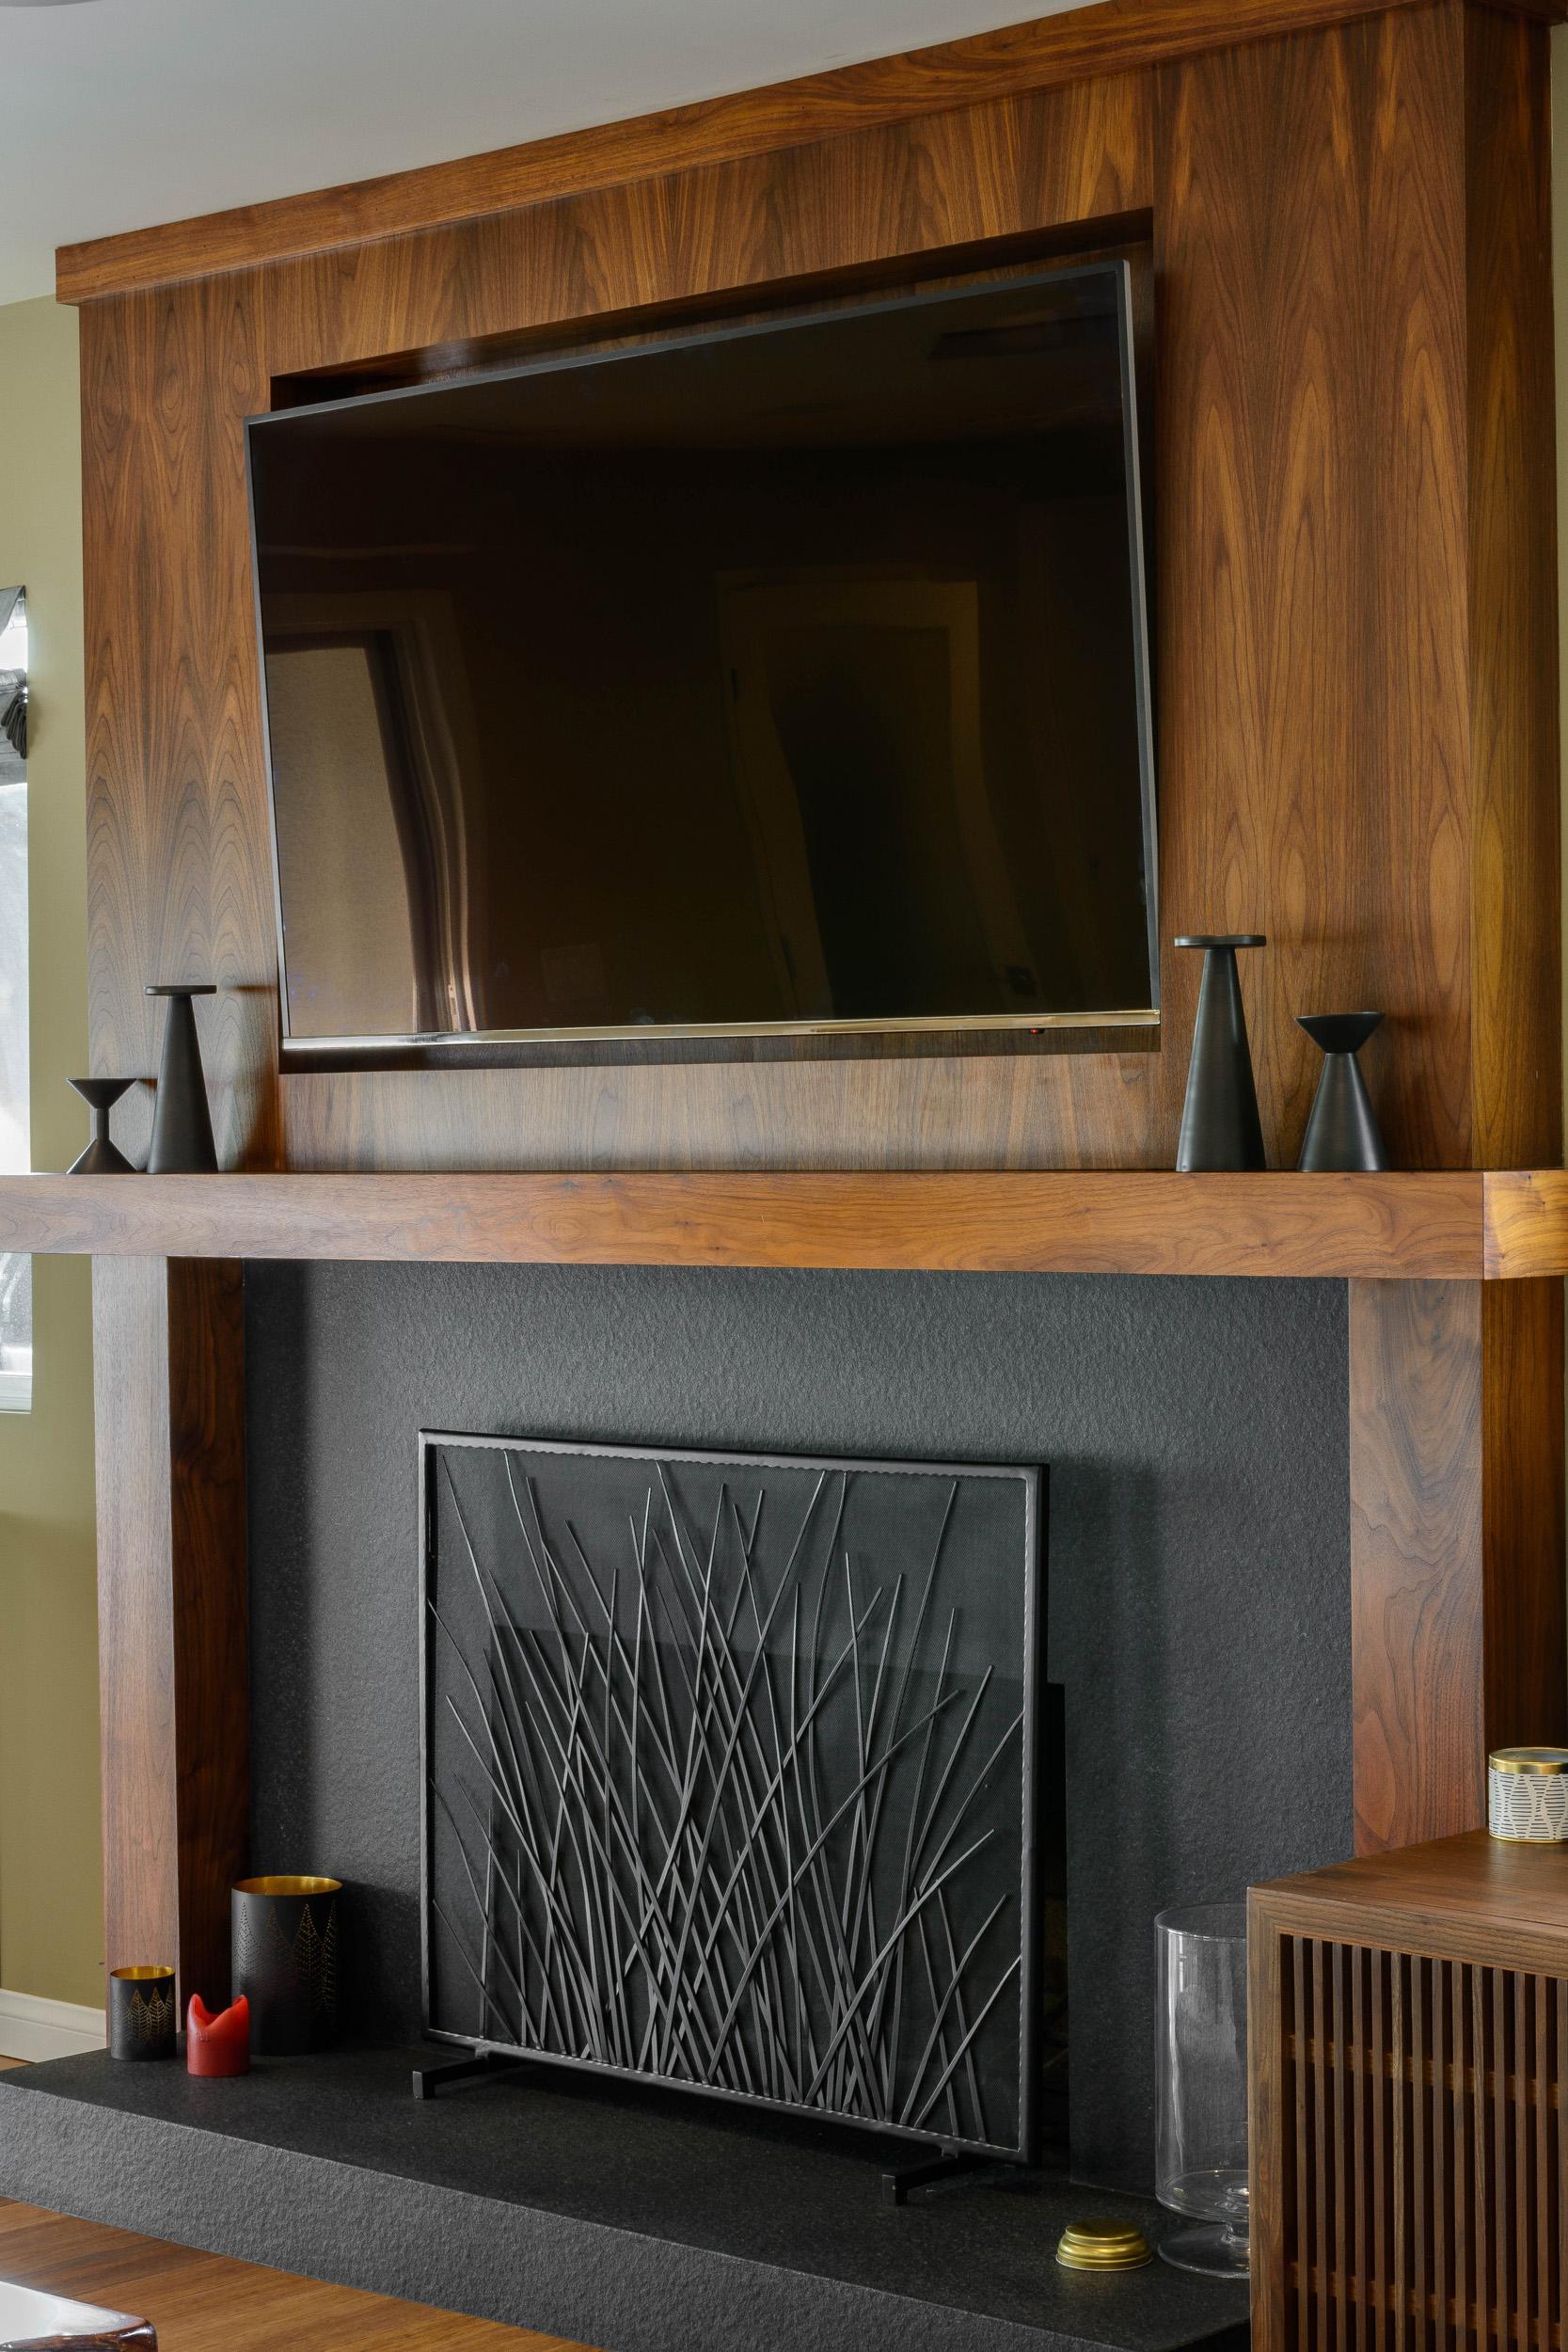 TV niche within a custom-built walnut fireplace surround